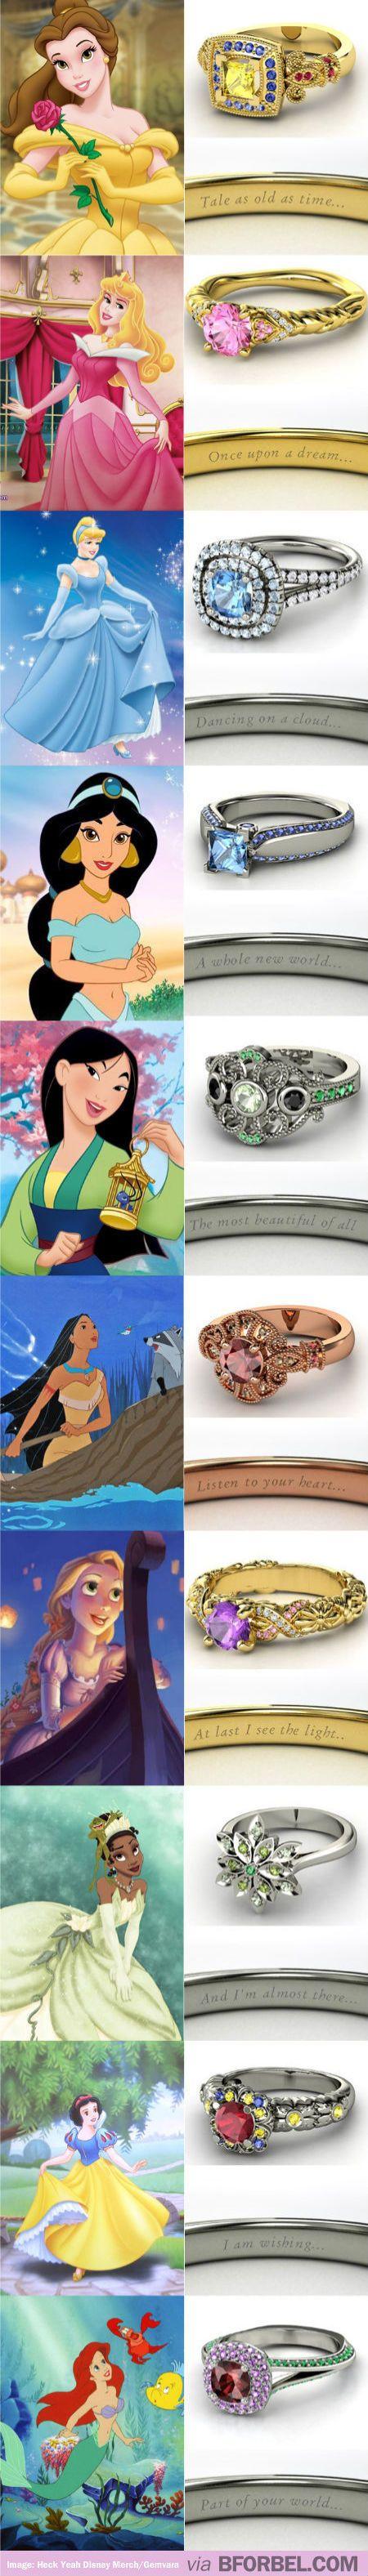 Disney Princess Inspired Wedding Rings… Love Cinderella's!